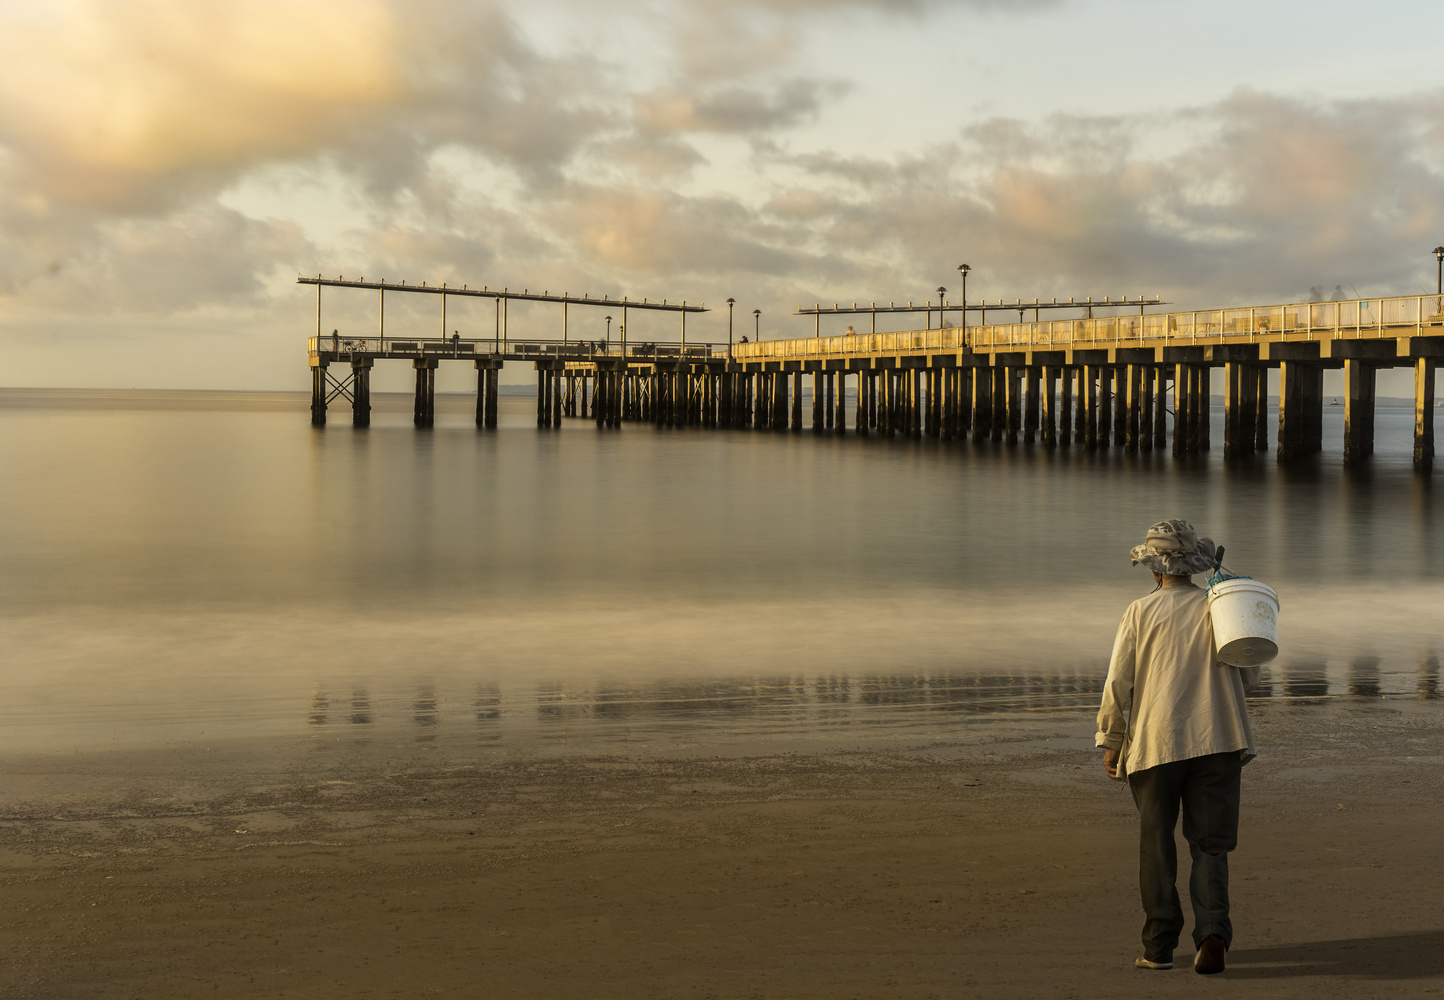 Sunrise and fisherman by Janna Broski